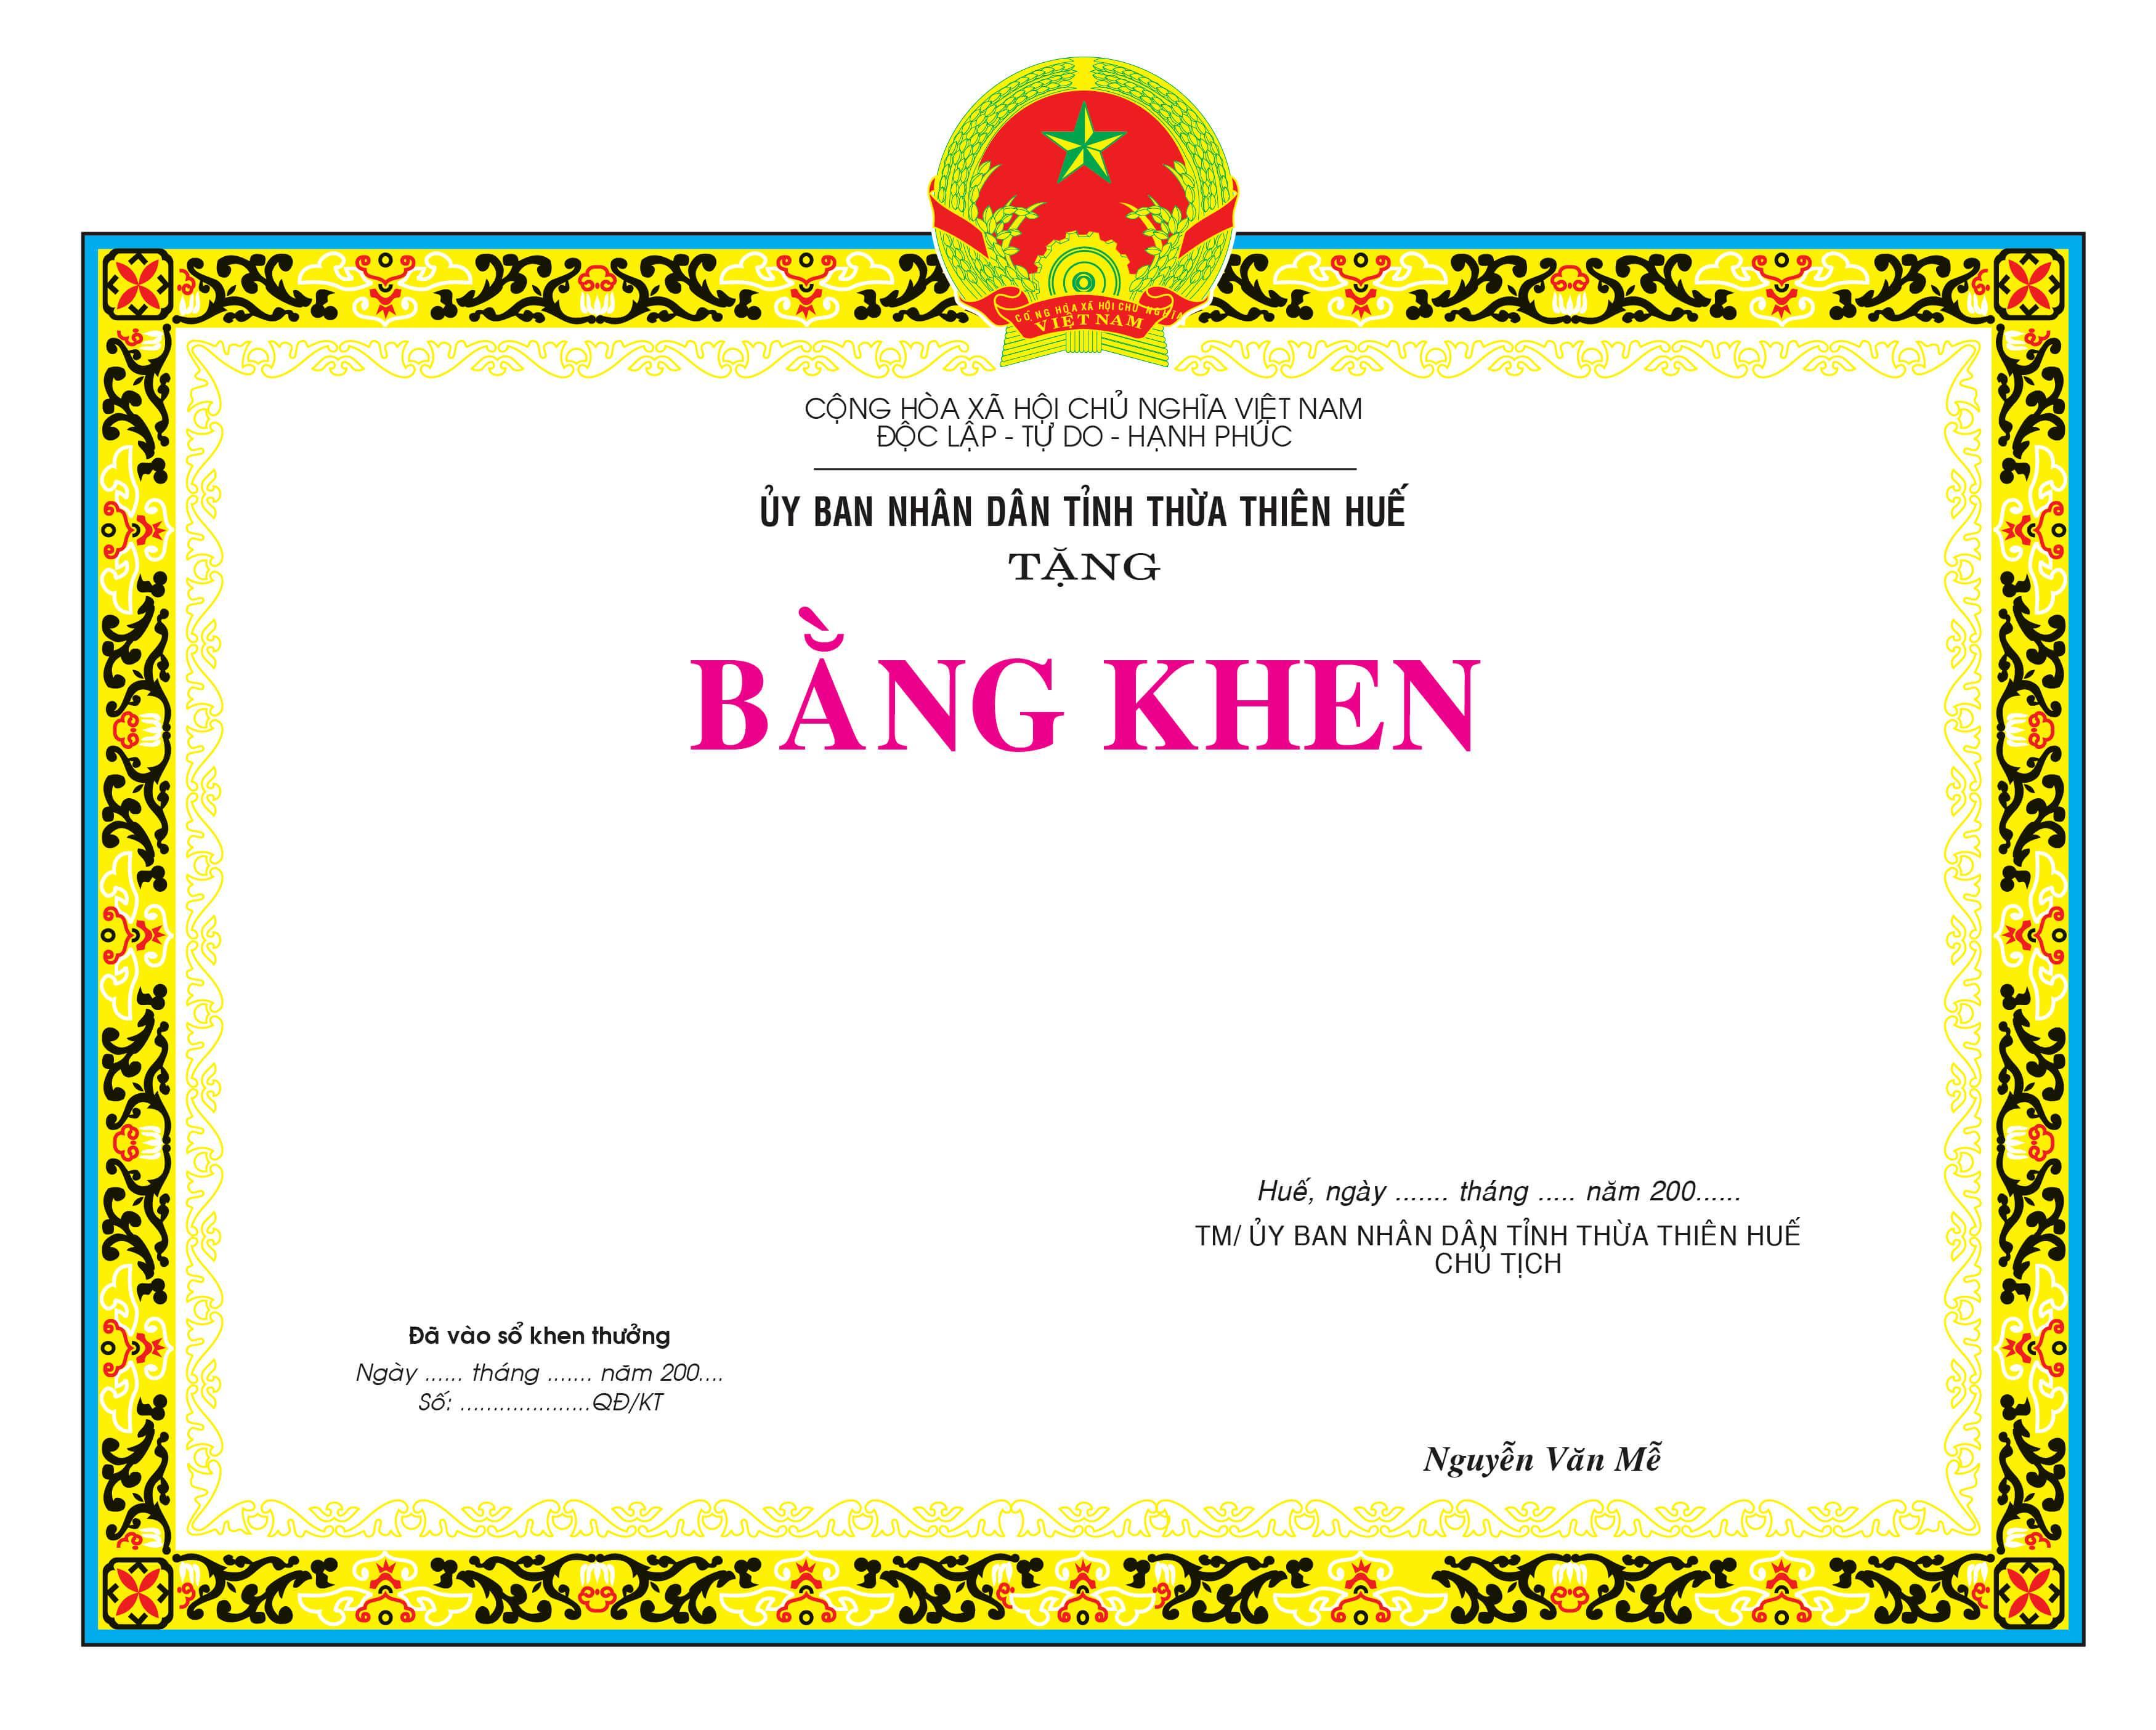 Mẫu giấy khen 055 - Giấy khen UBND - link download : https://adsnew.net/ExUAxORY